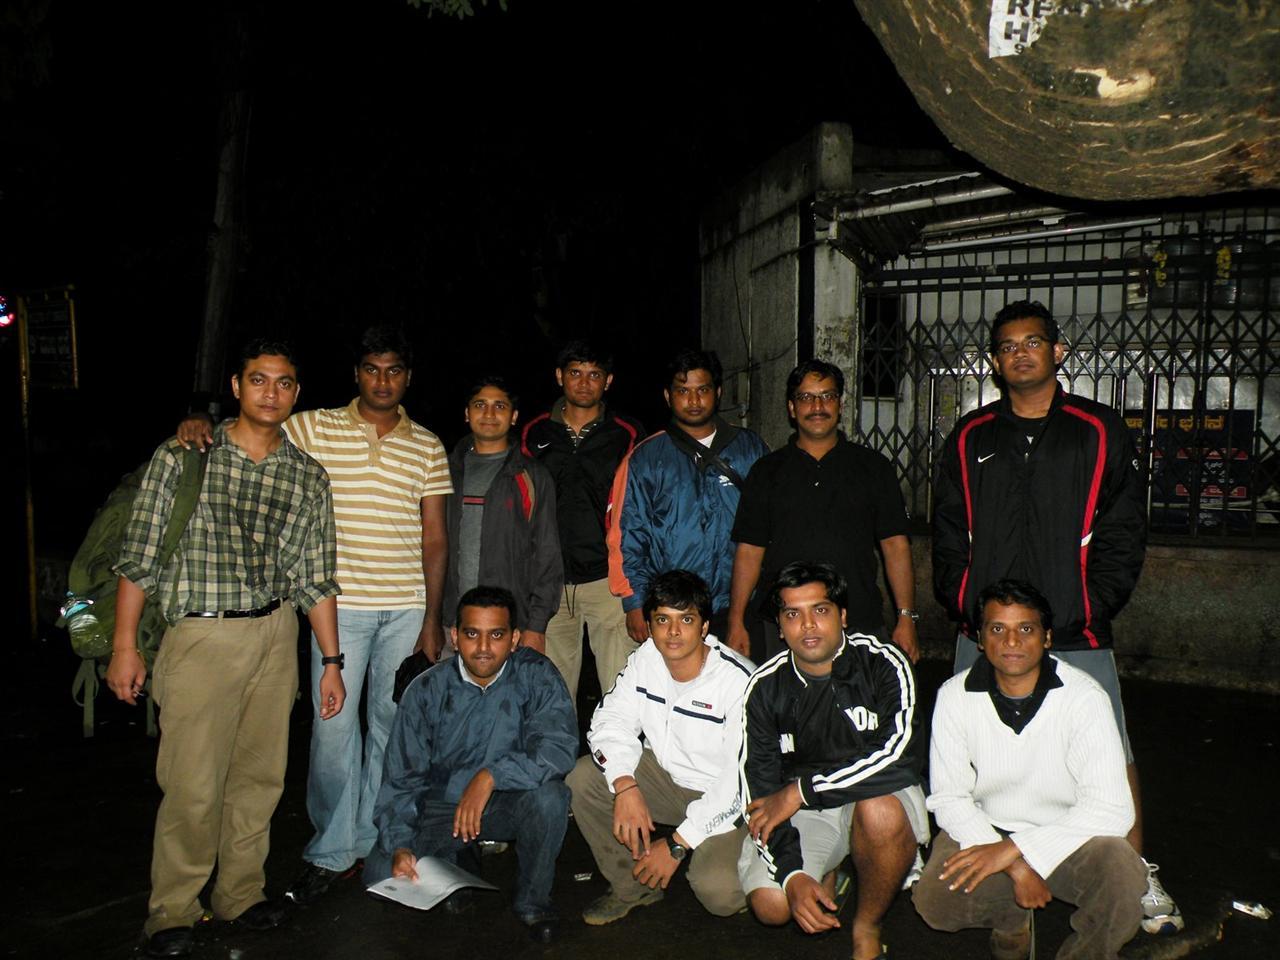 The random Orkut group